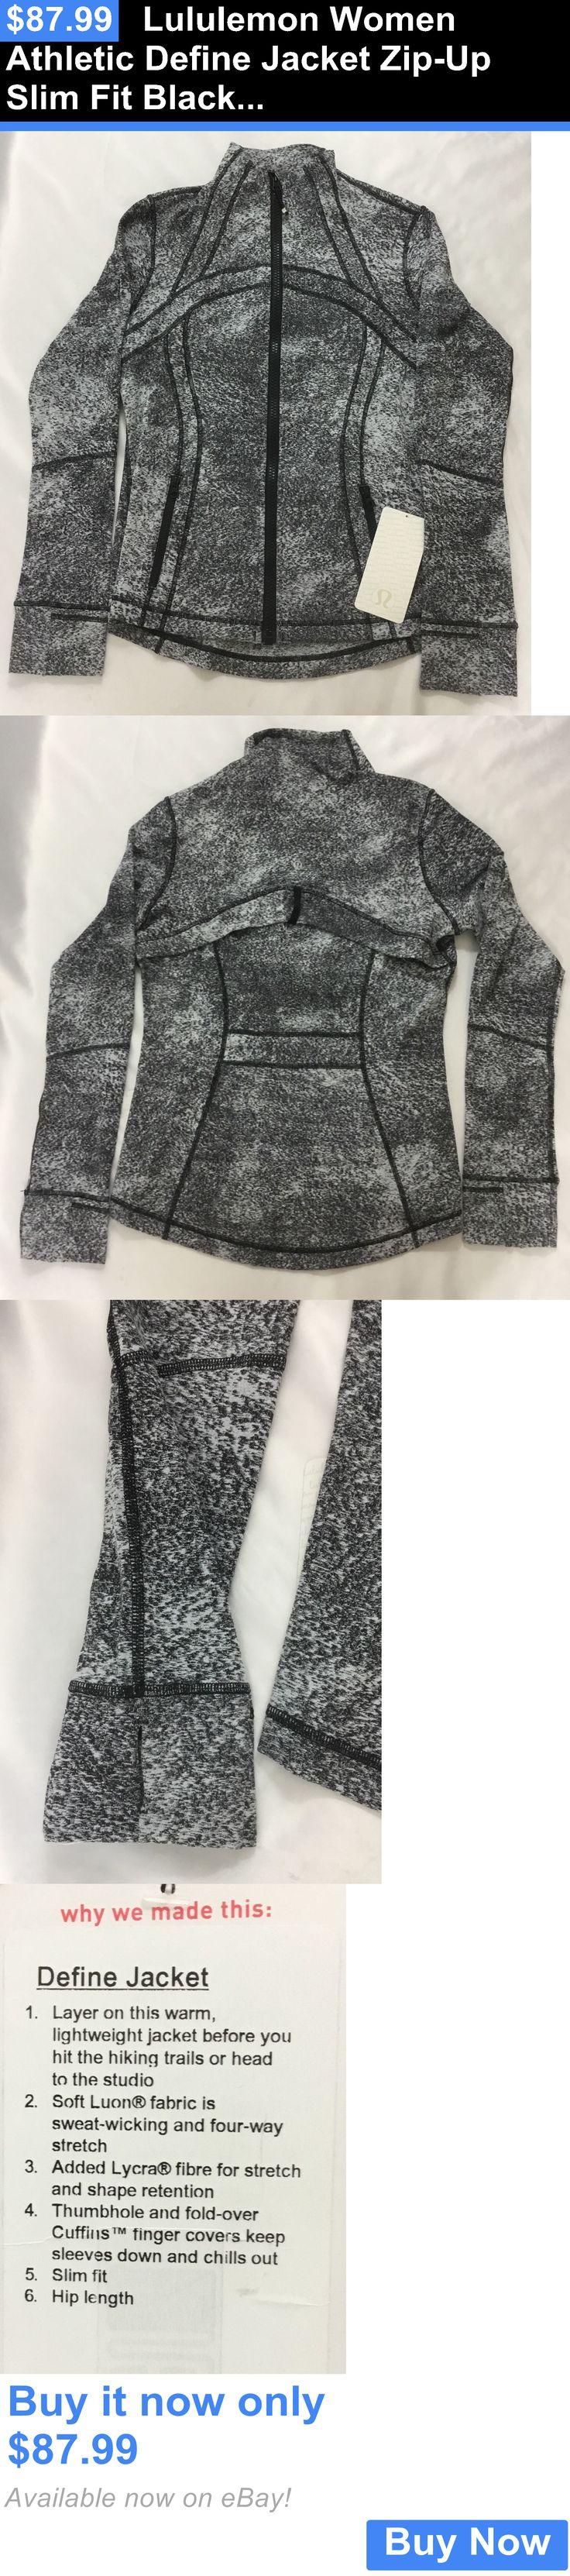 Women Athletics: Lululemon Women Athletic Define Jacket Zip-Up Slim Fit Black White Lsja Print 4 BUY IT NOW ONLY: $87.99